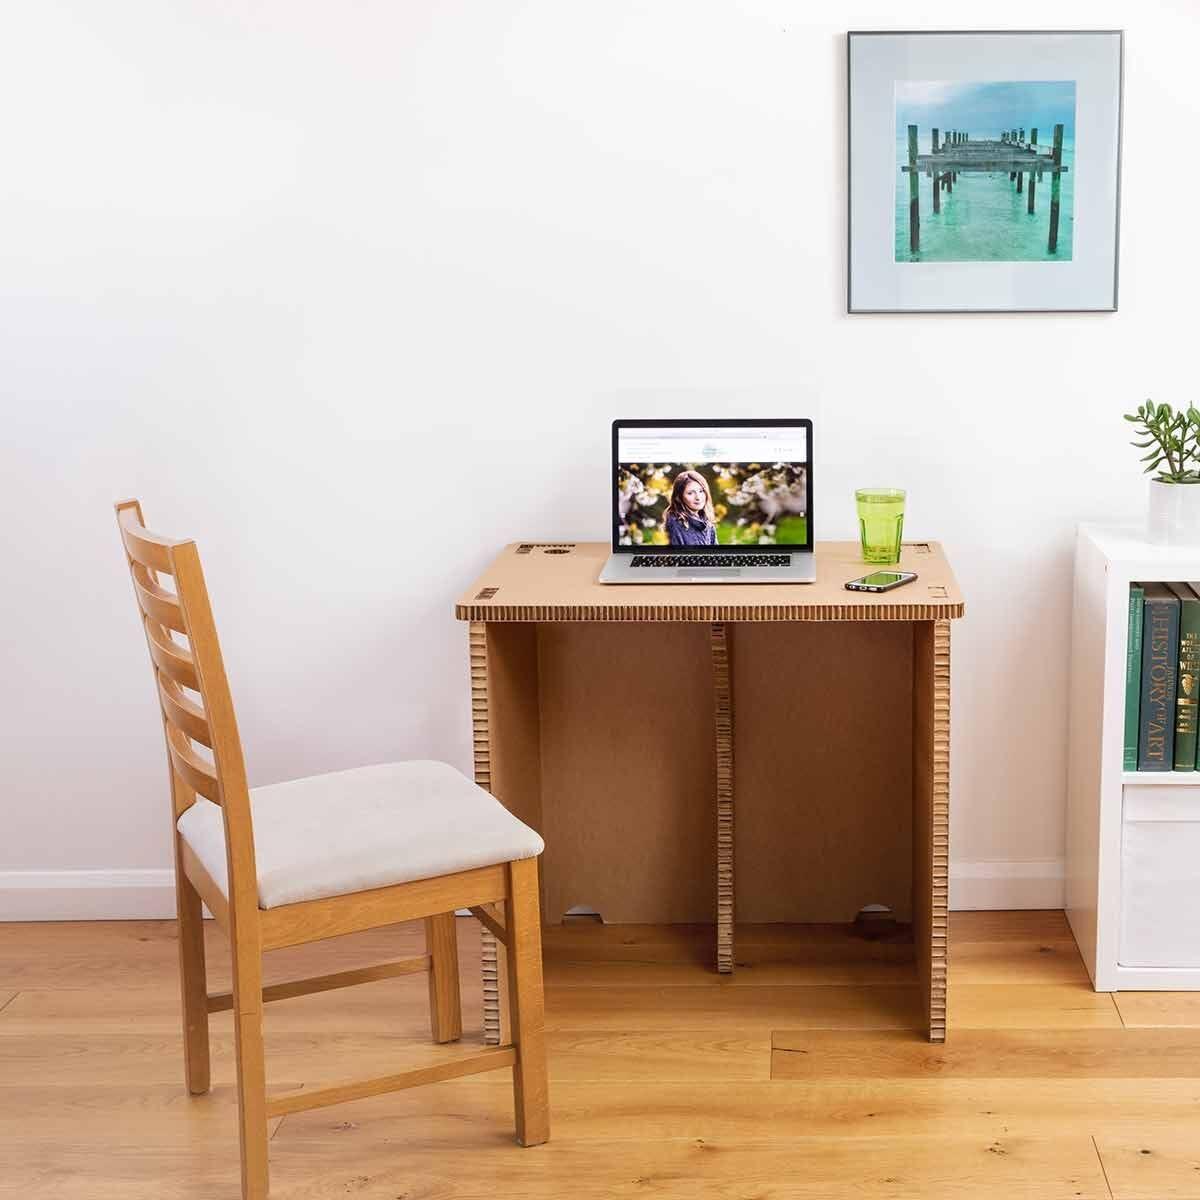 The Paper Hive Pop Up Cardboard Desk 800 x 600mm